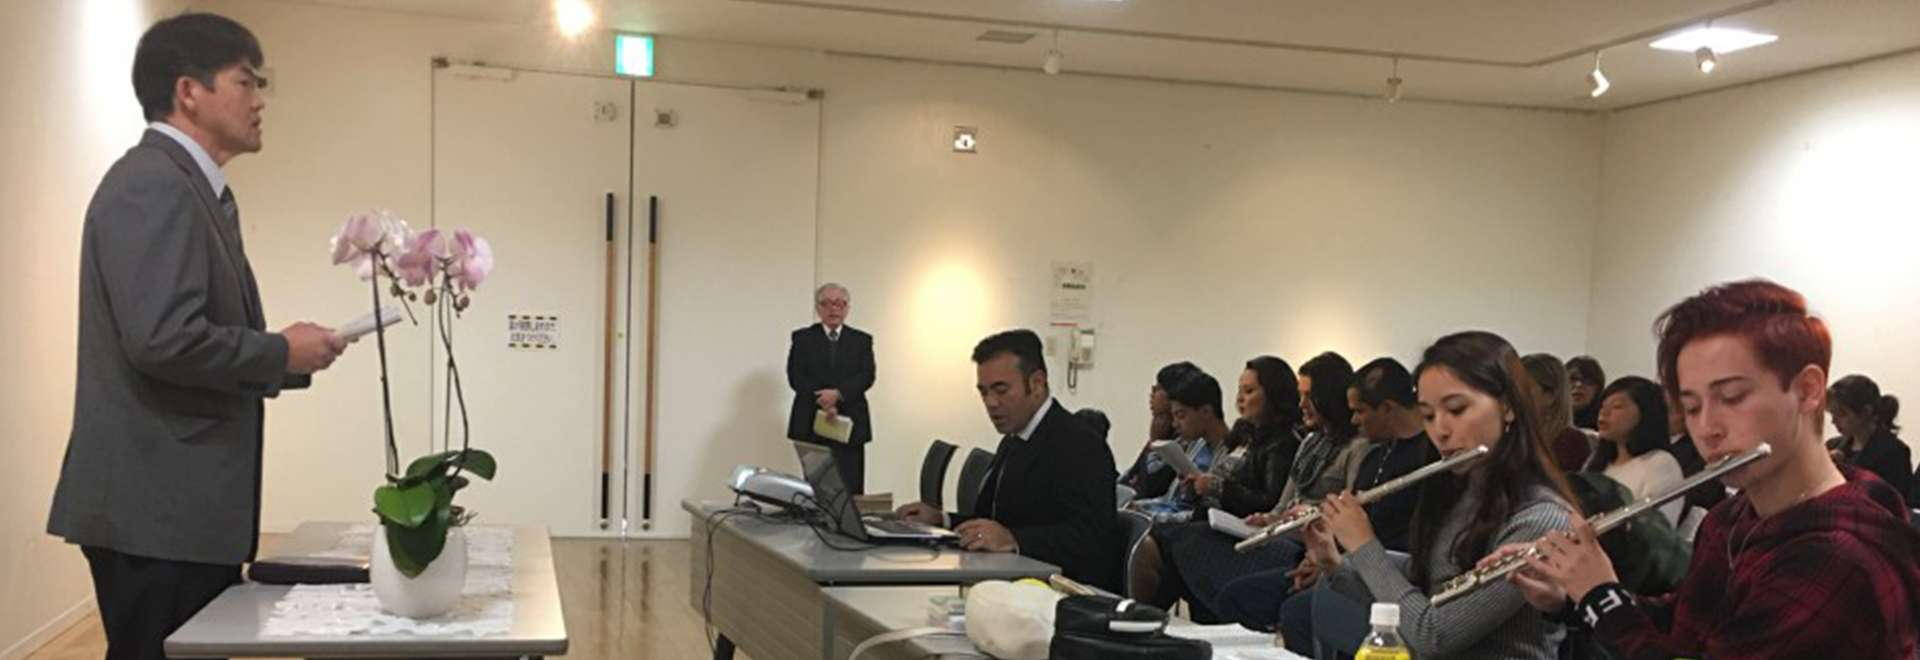 Igreja Cristã Maranta realiza seminário em Nagoya, Japão